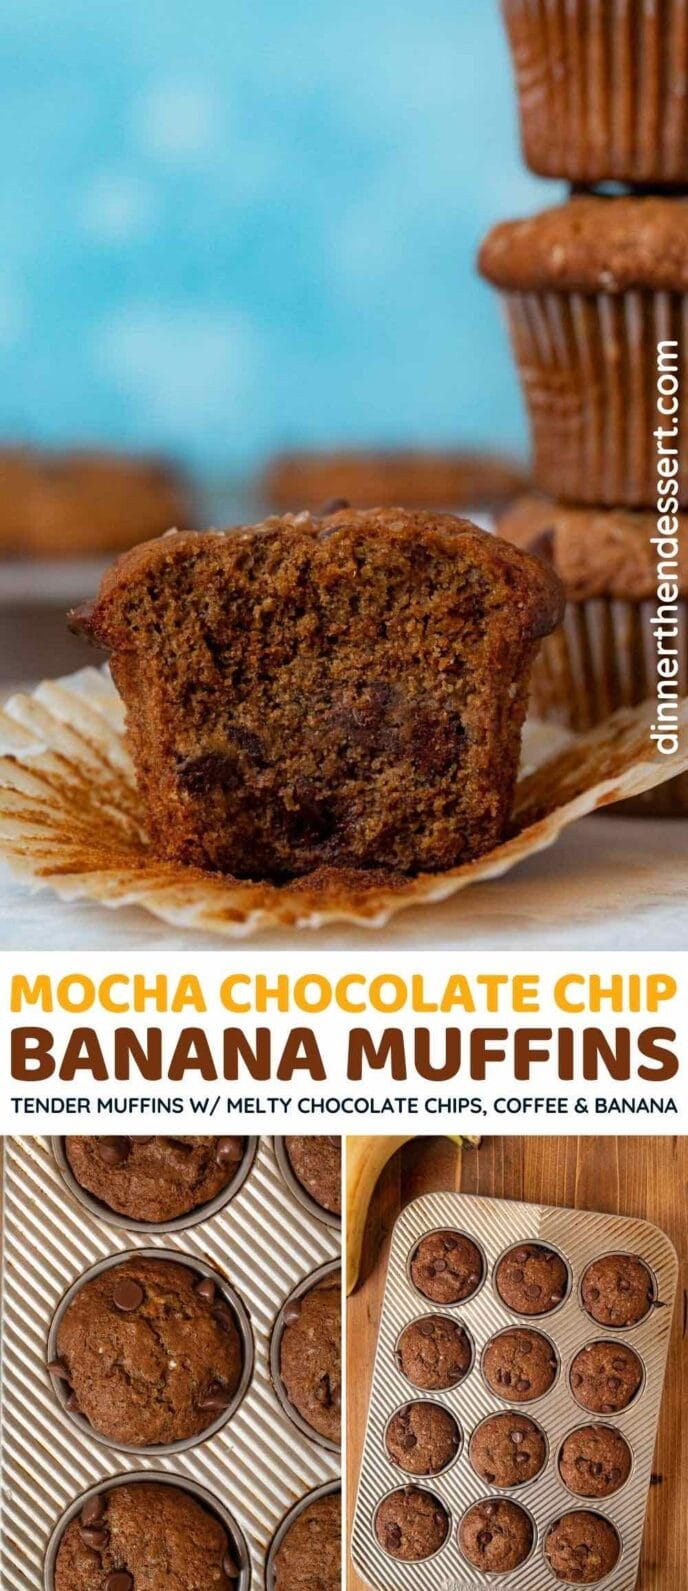 Mocha Chocolate Chip Banana Muffins collage